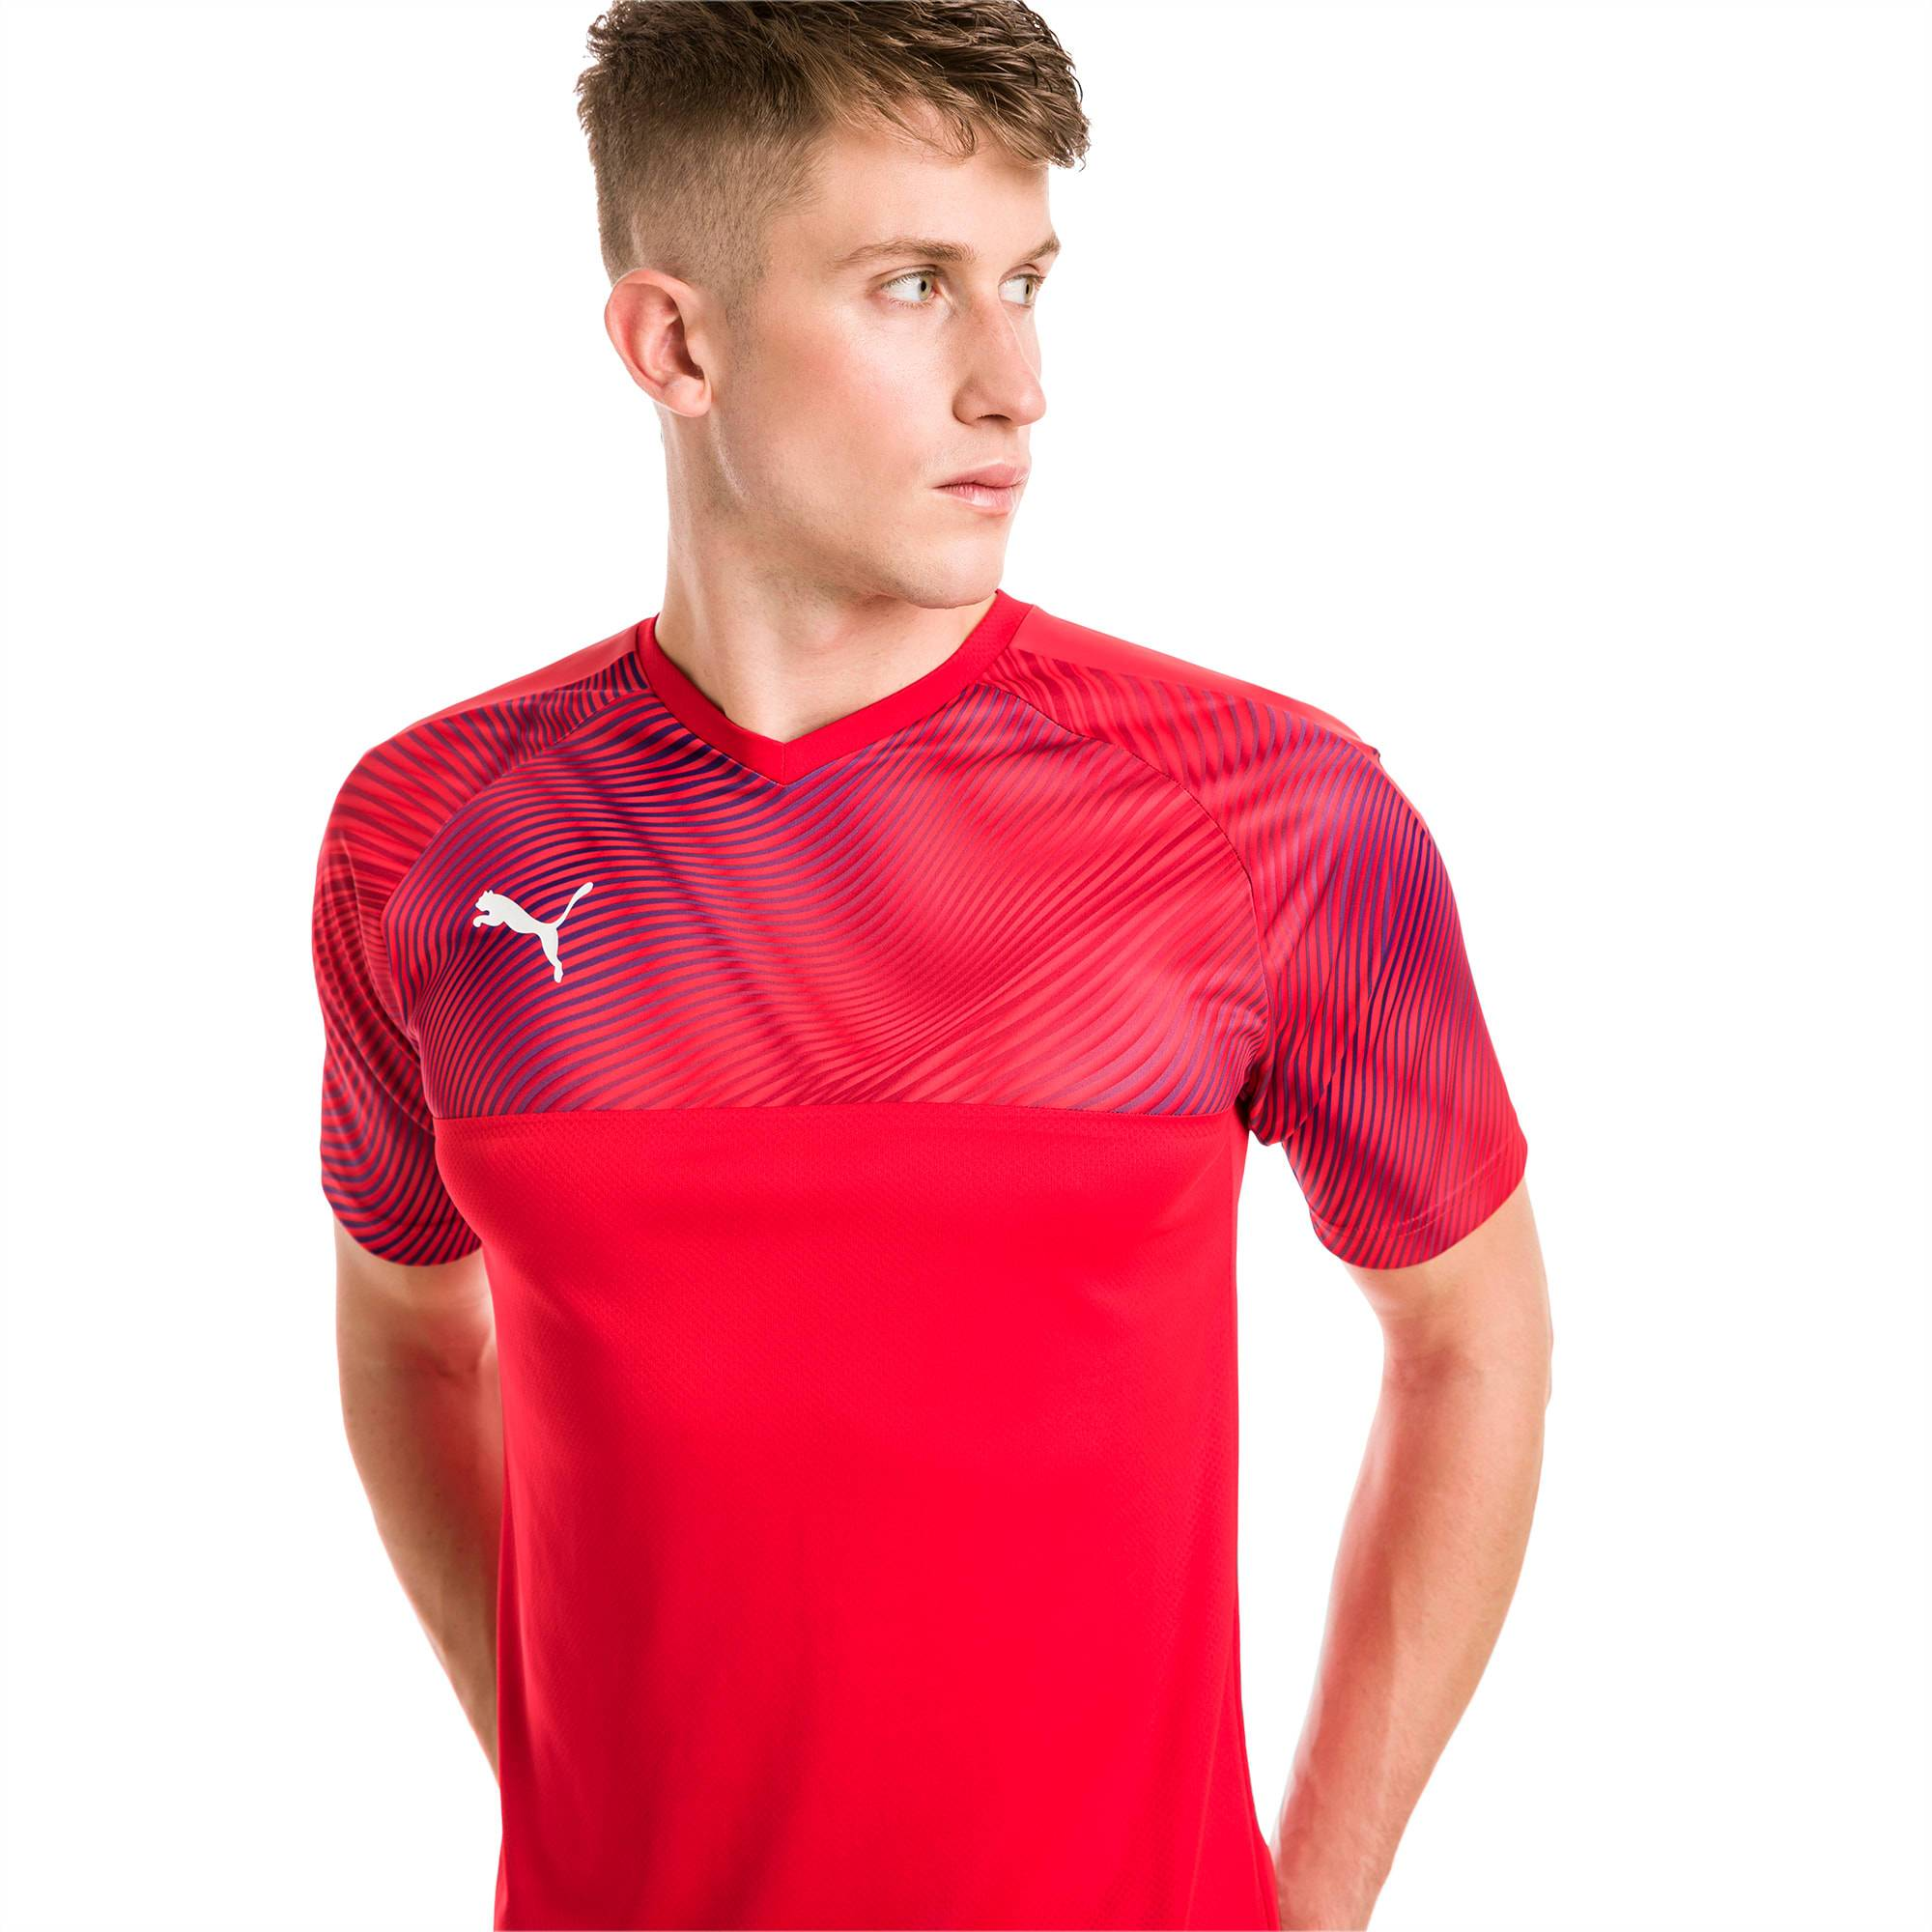 PUMA Maillot Football CUP pour Homme, Rouge/Blanc, Taille XS, Vêtements